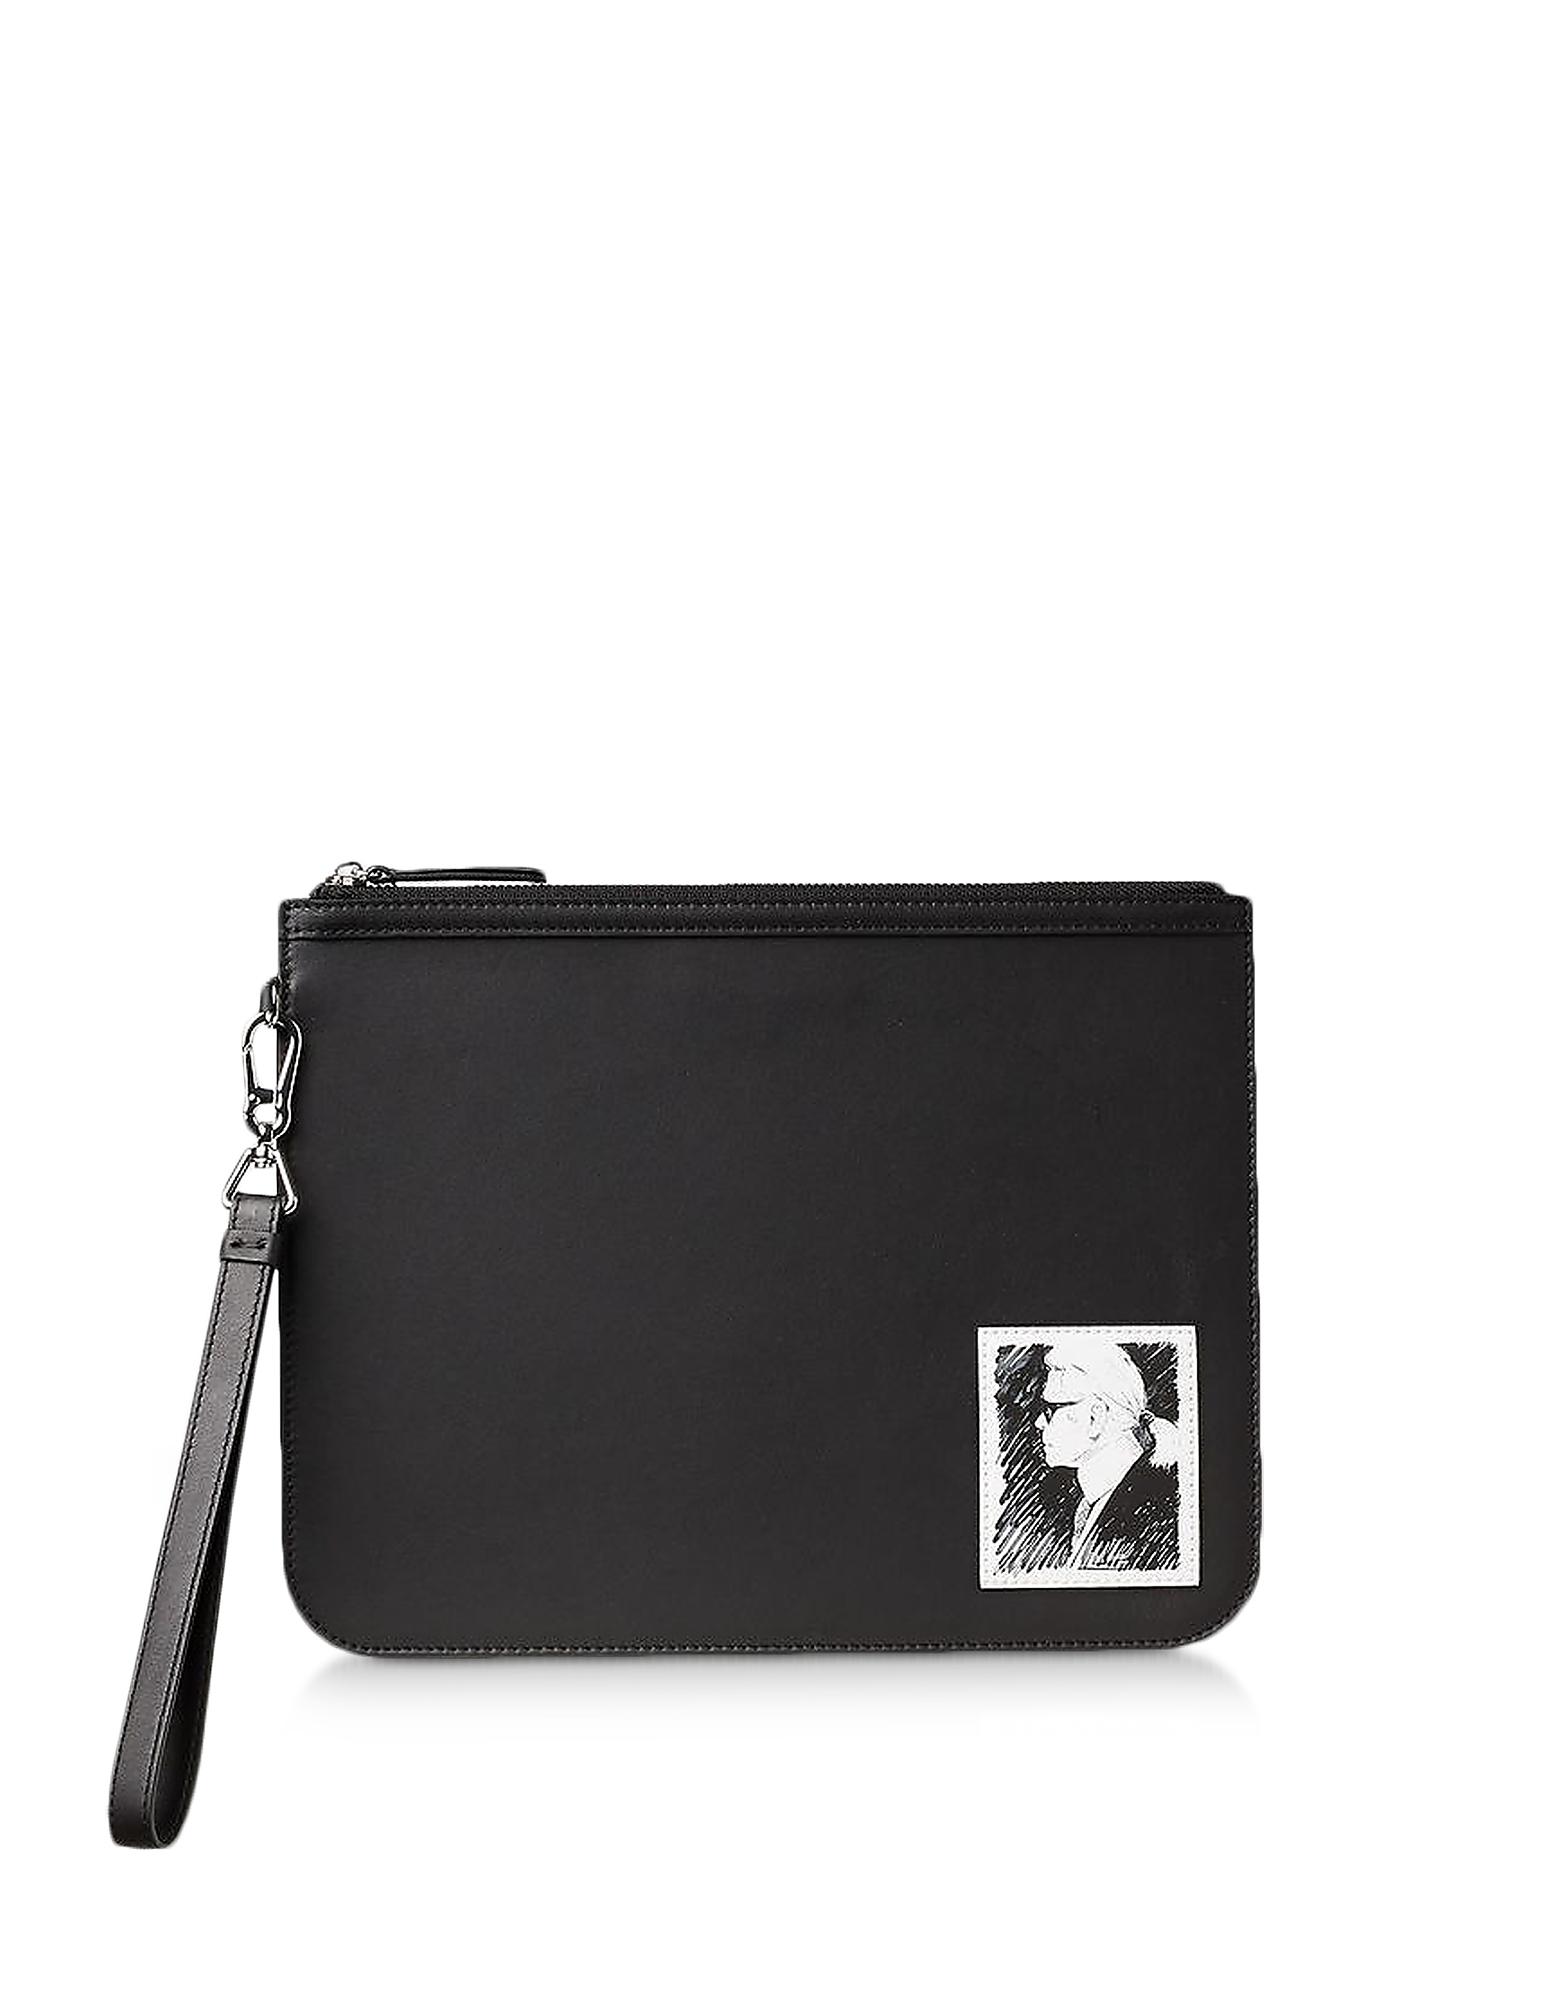 Karl Lagerfeld Designer Handbags, Karl Legend Elegance Clutch